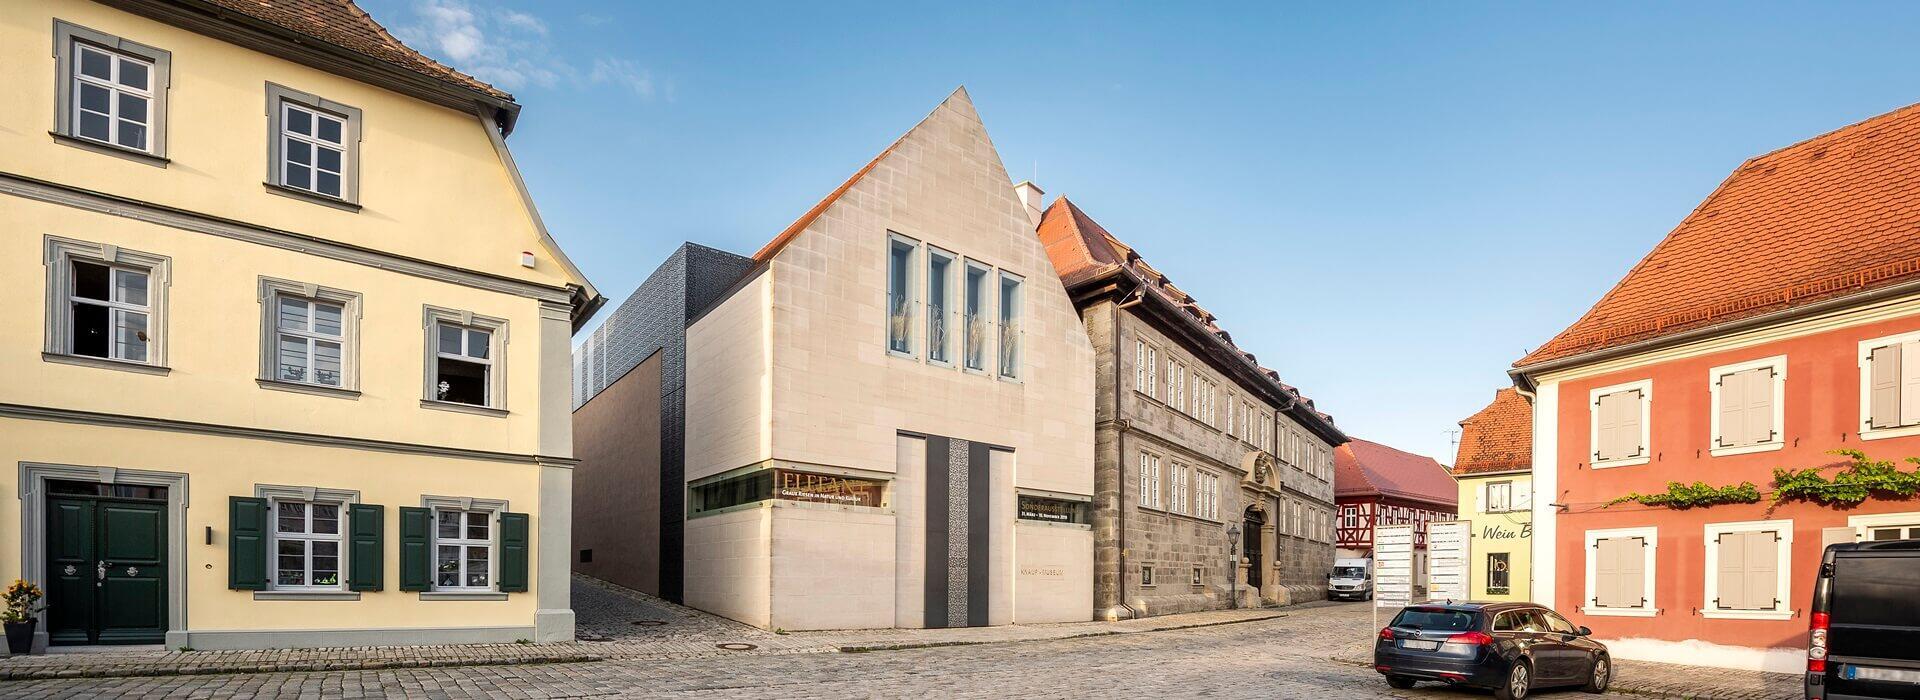 Knaufmuseum_Iphofen_Landkreis_Kitzingen